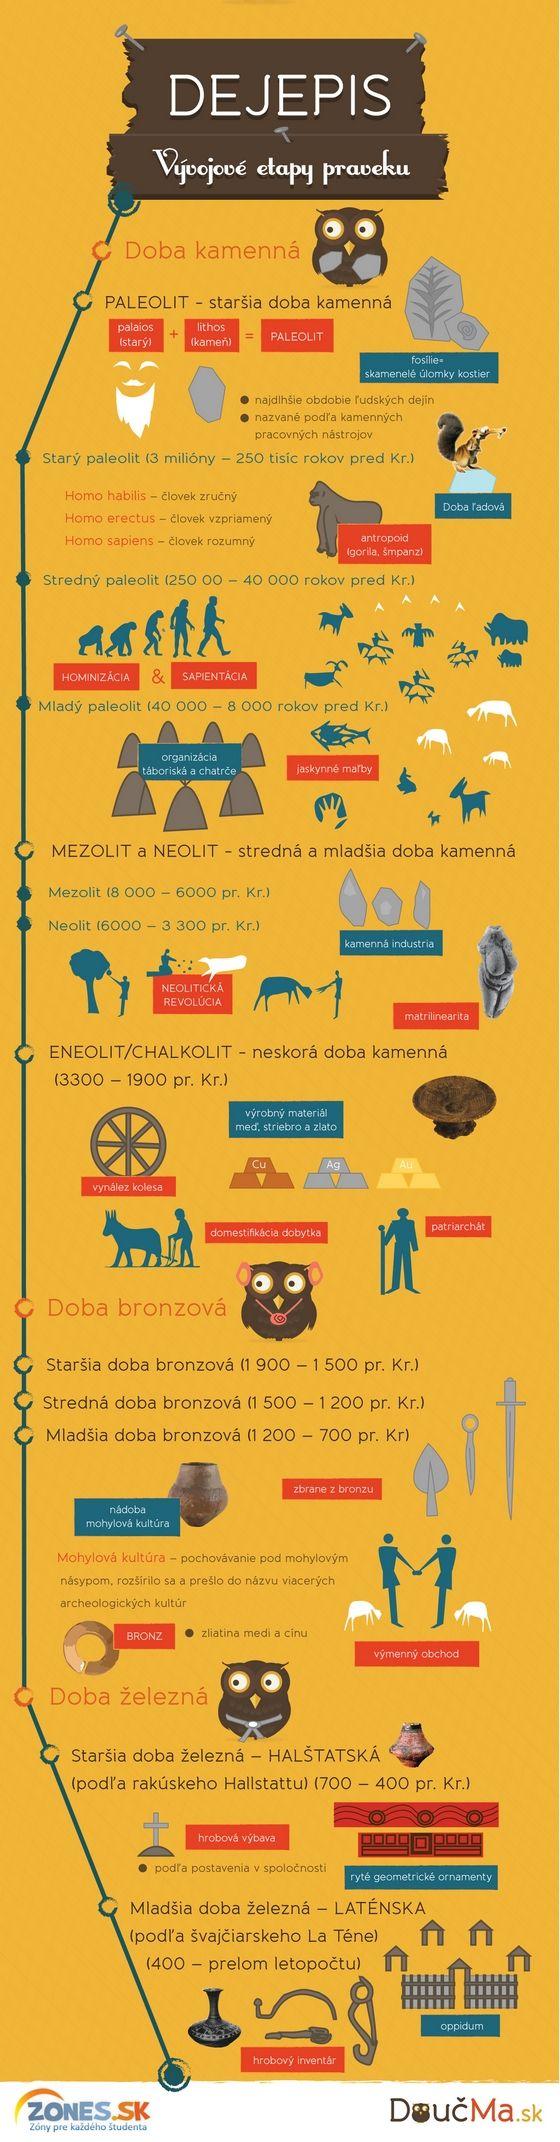 infografika dějepis - Hledat Googlem